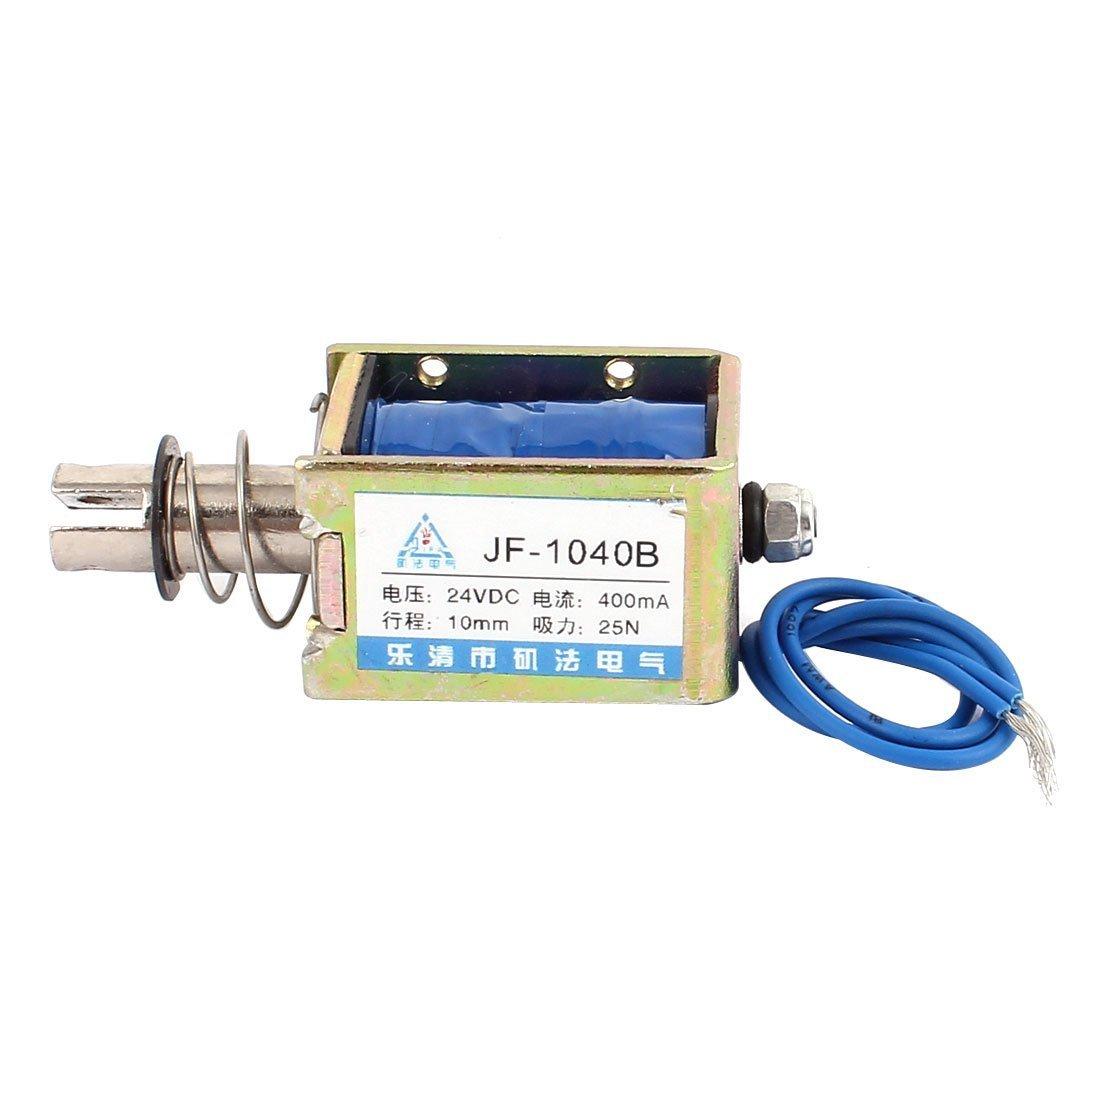 Amazon.com: eDealMax JF-1040B DC24V 400mA 10mm empuje 25N Tire electroimán del solenoide del imán: Home & Kitchen